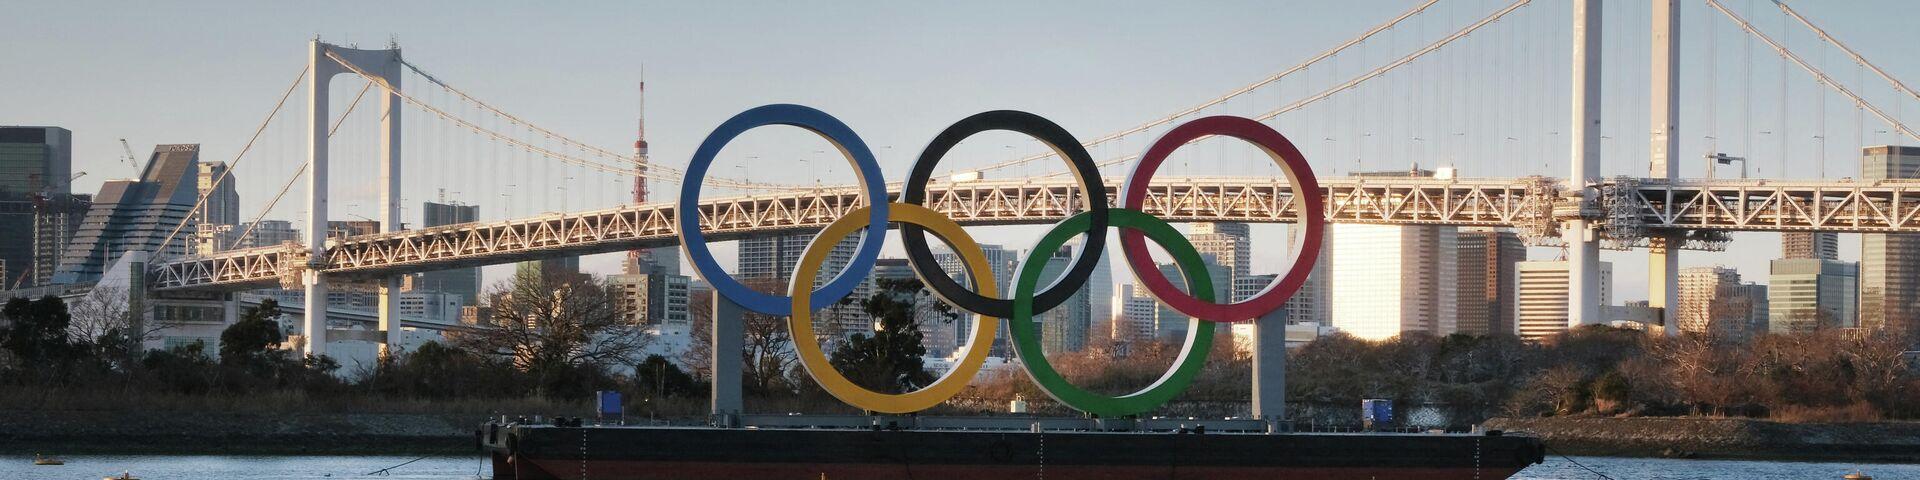 Олимпийские кольца в Токио - РИА Новости, 1920, 15.07.2021